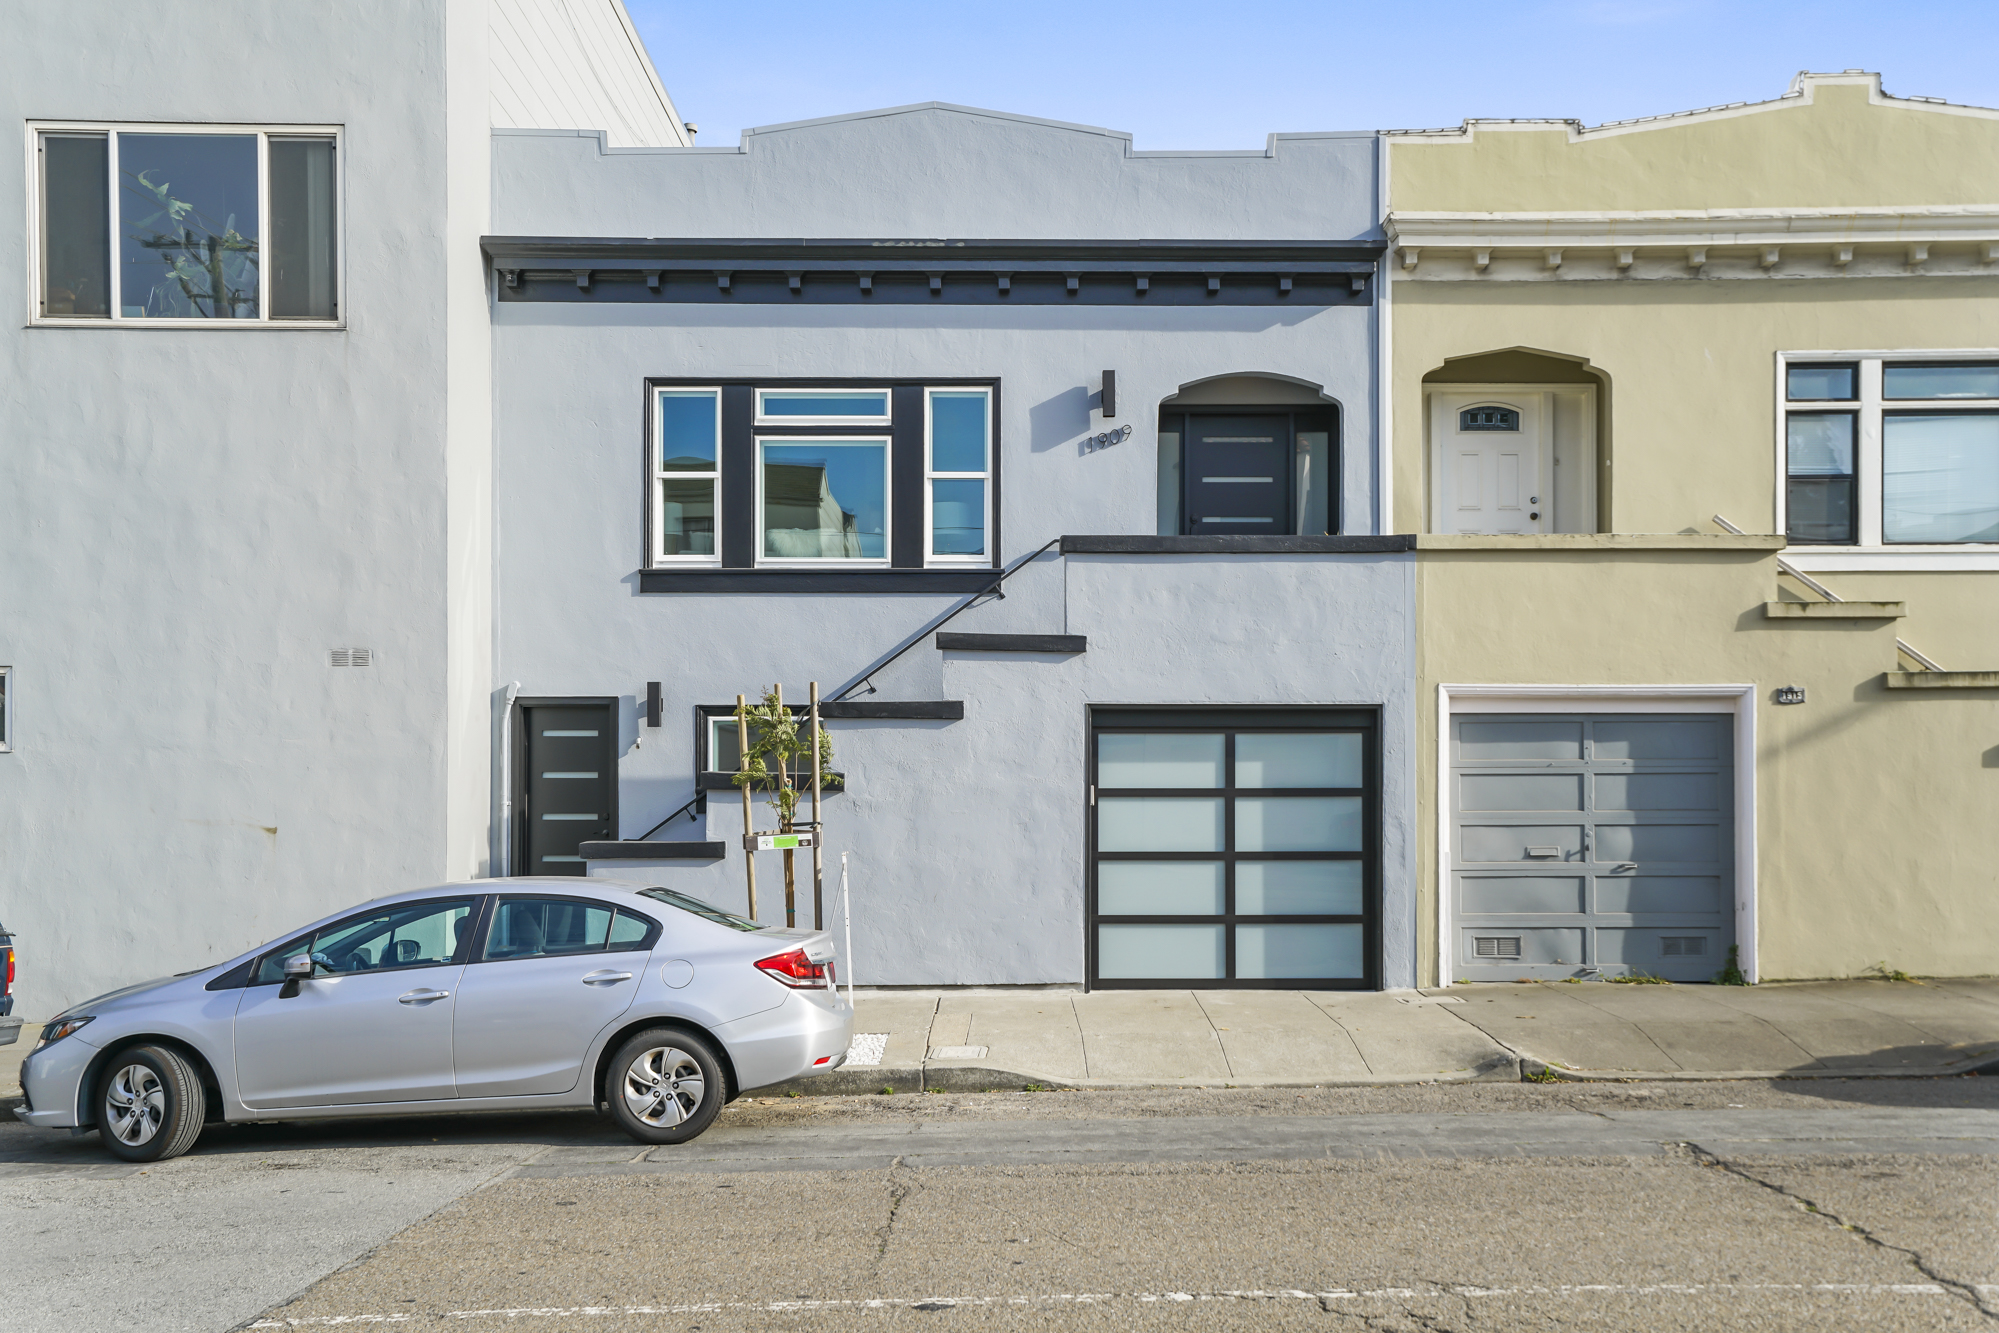 Just Sold by Alek Keytiyev Realtor - Newly remodeled luxury home at 1909 Judah in San Francisco